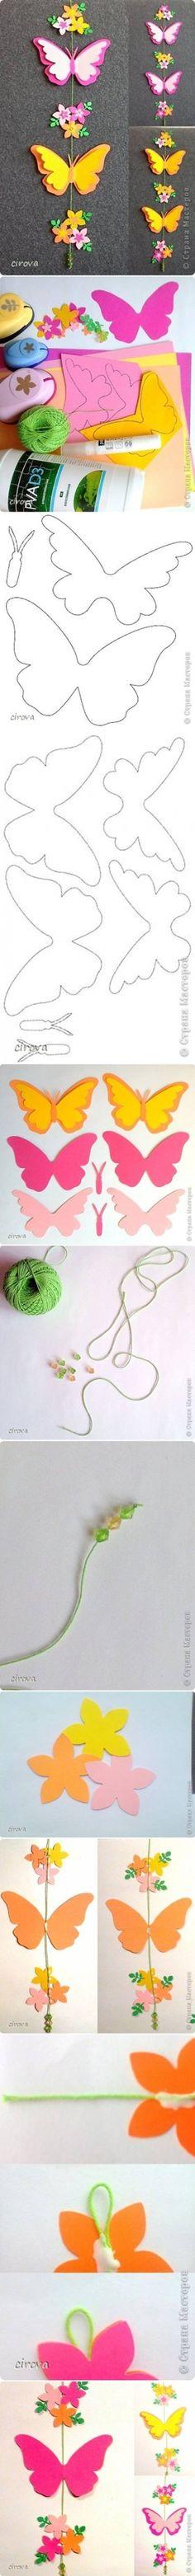 DIY de la mariposa del Papel Móvil DIY Paper Butterfly Mobile.